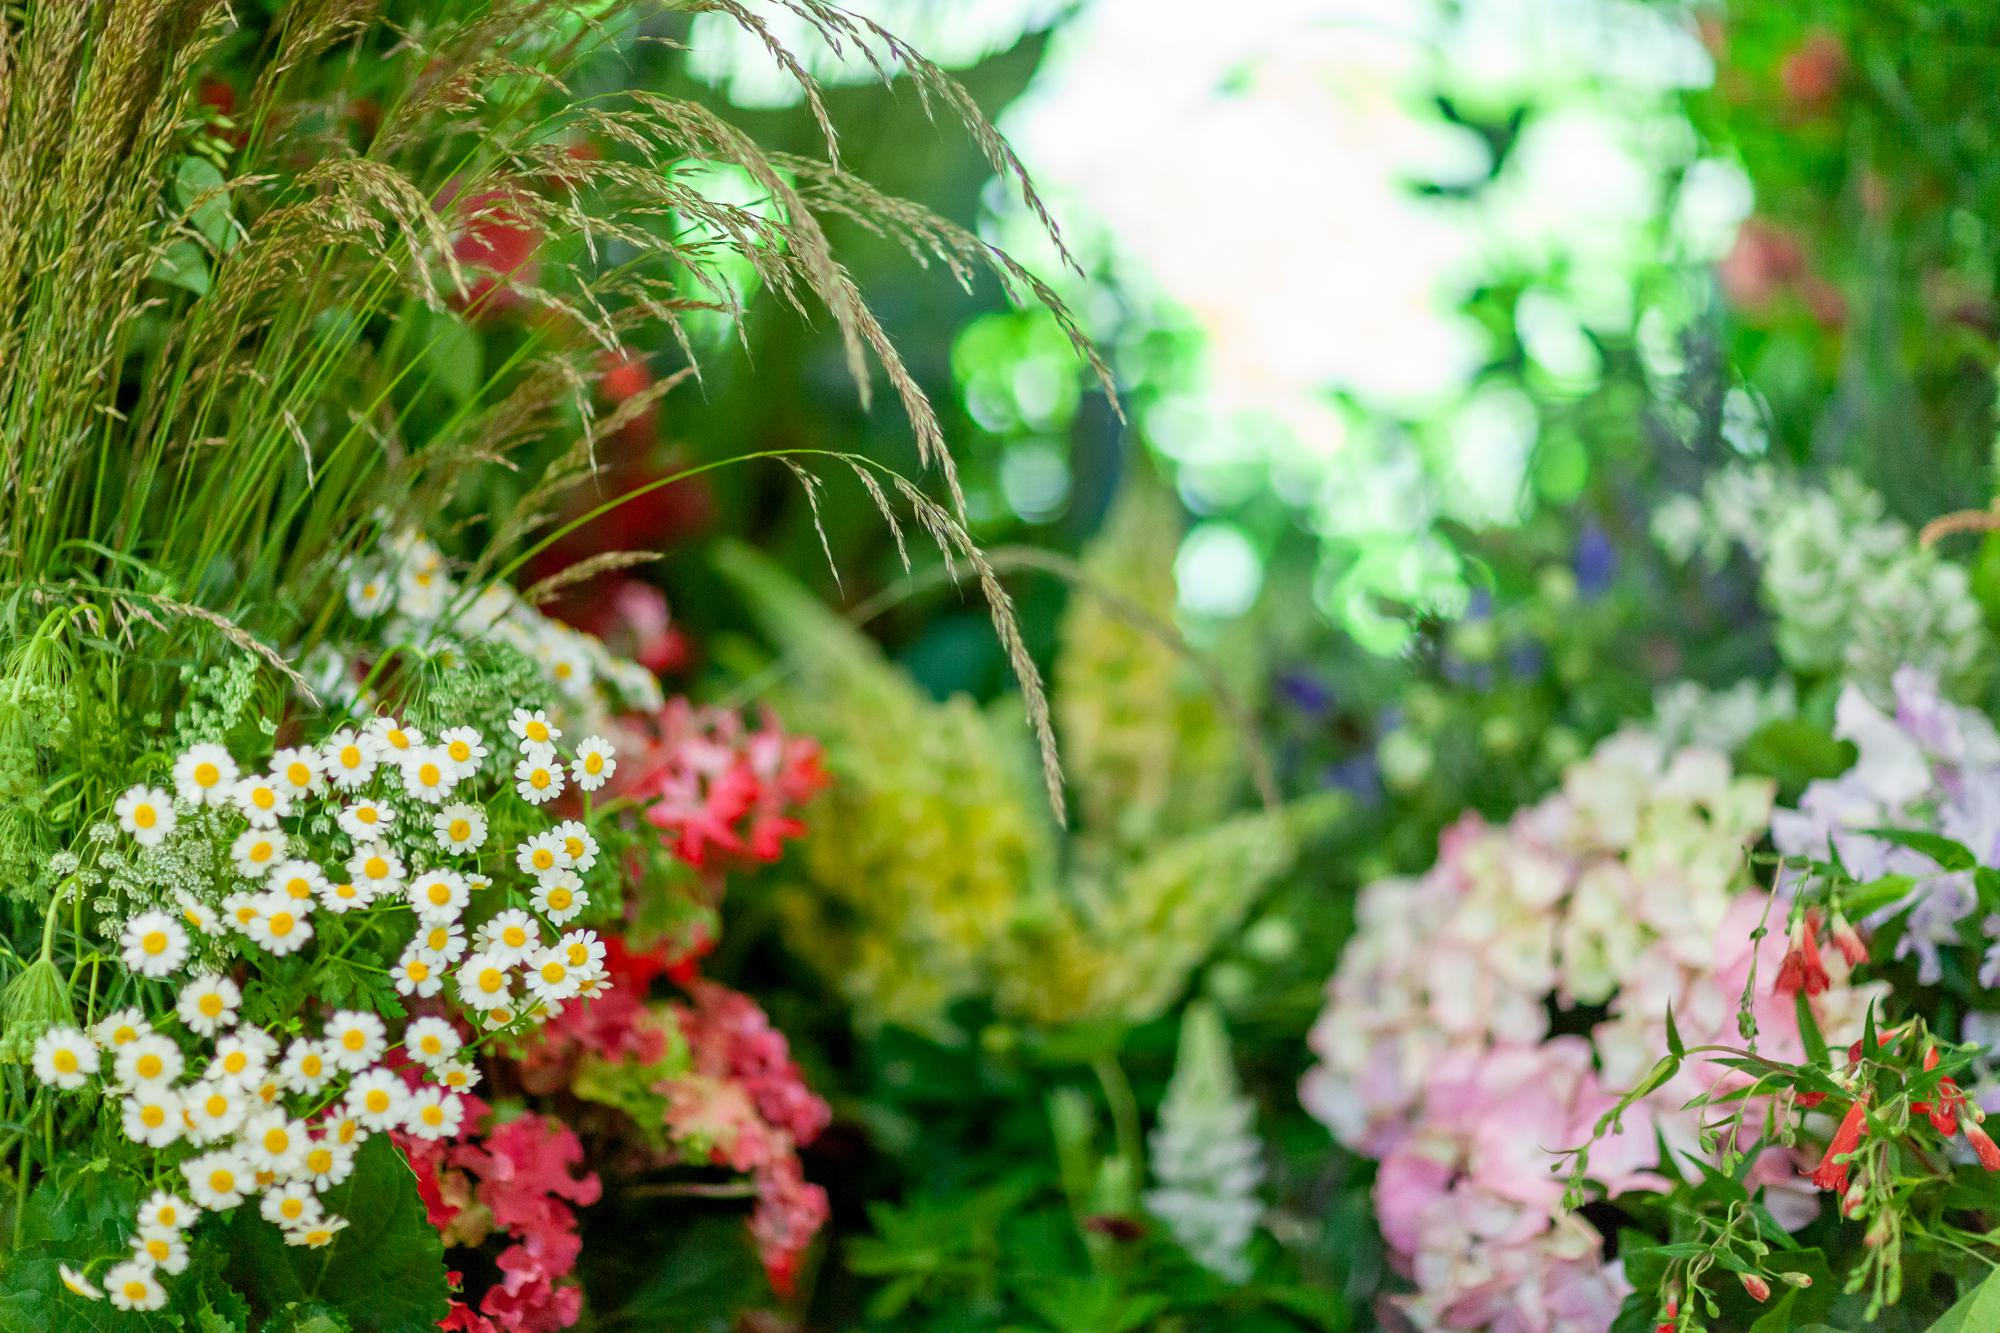 Veevers-Carter-installation-British-Flowers-Week-2018-at-Garden-Museum-by-New-Covent-Garden-Market (1).jpg